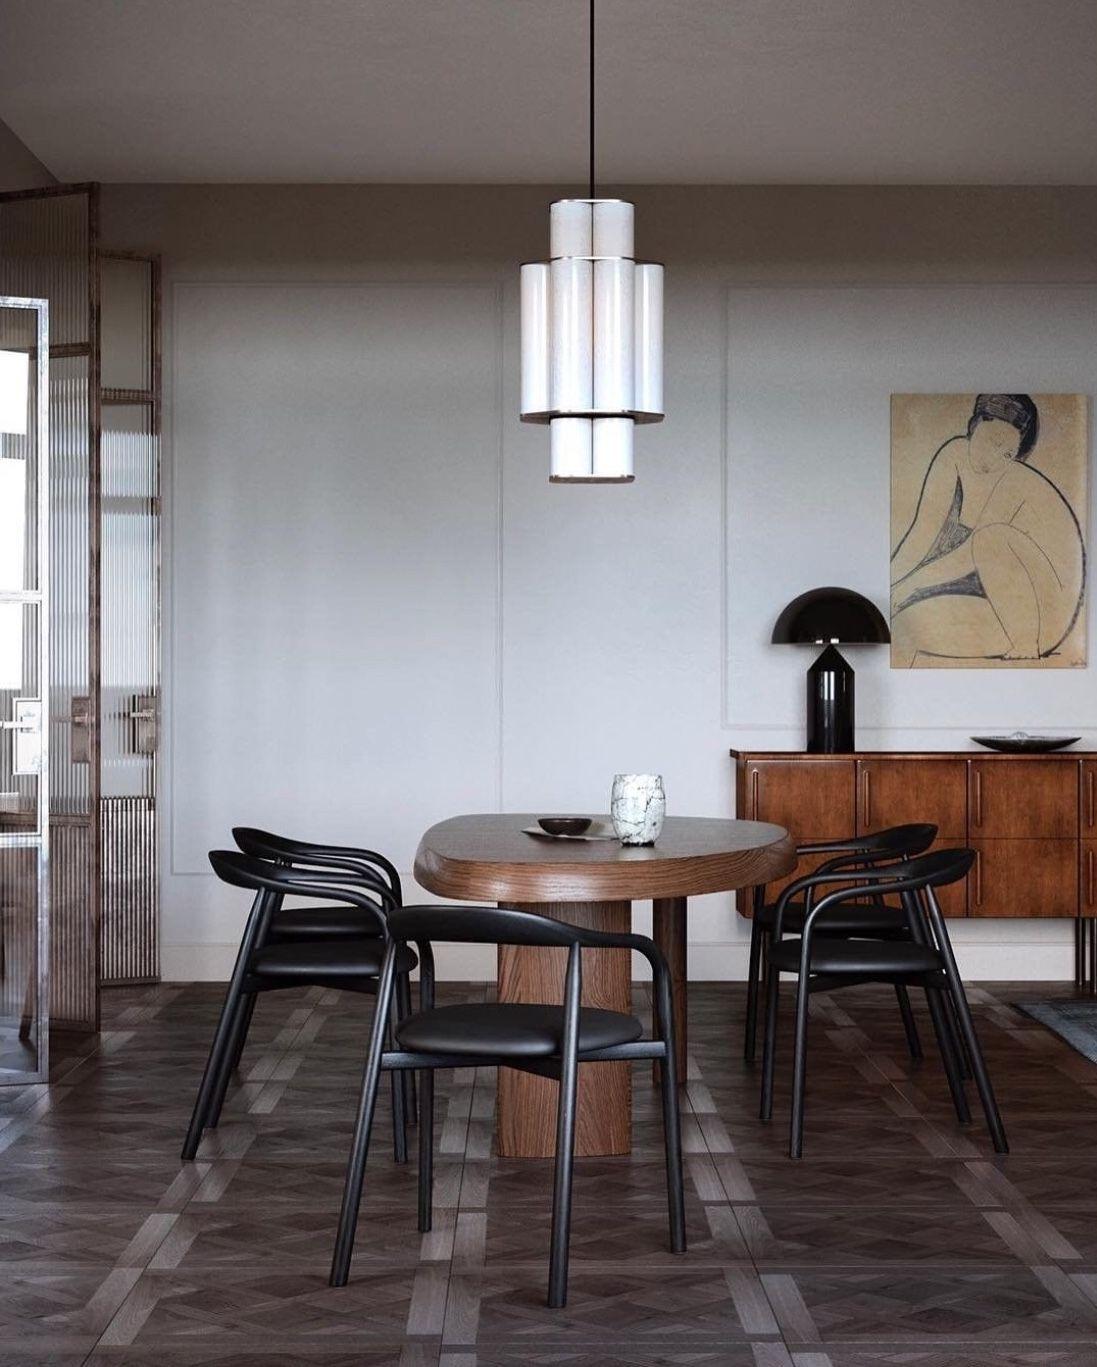 Pin By Nicki Tuan On Myspace2019 Beautiful Interiors Dining Room Design Interior